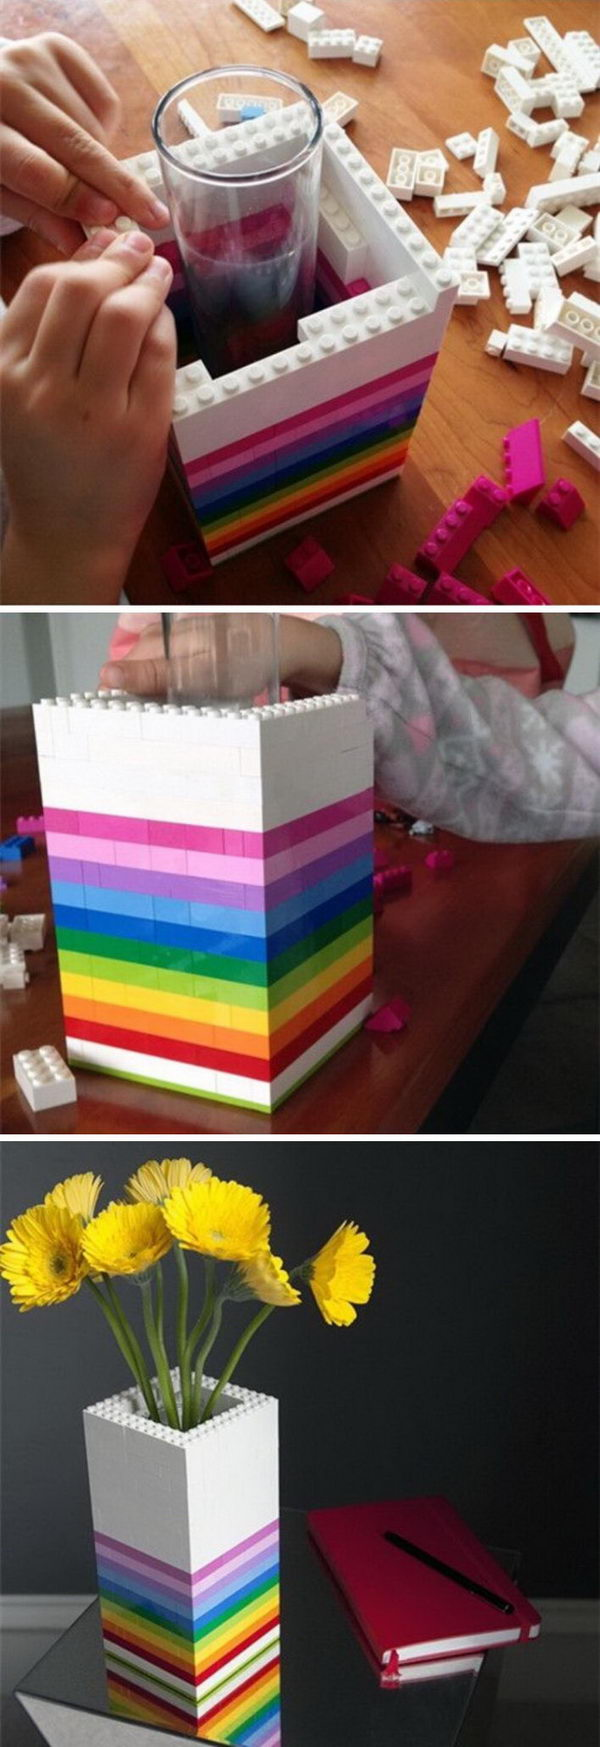 DIY Lego Vase.